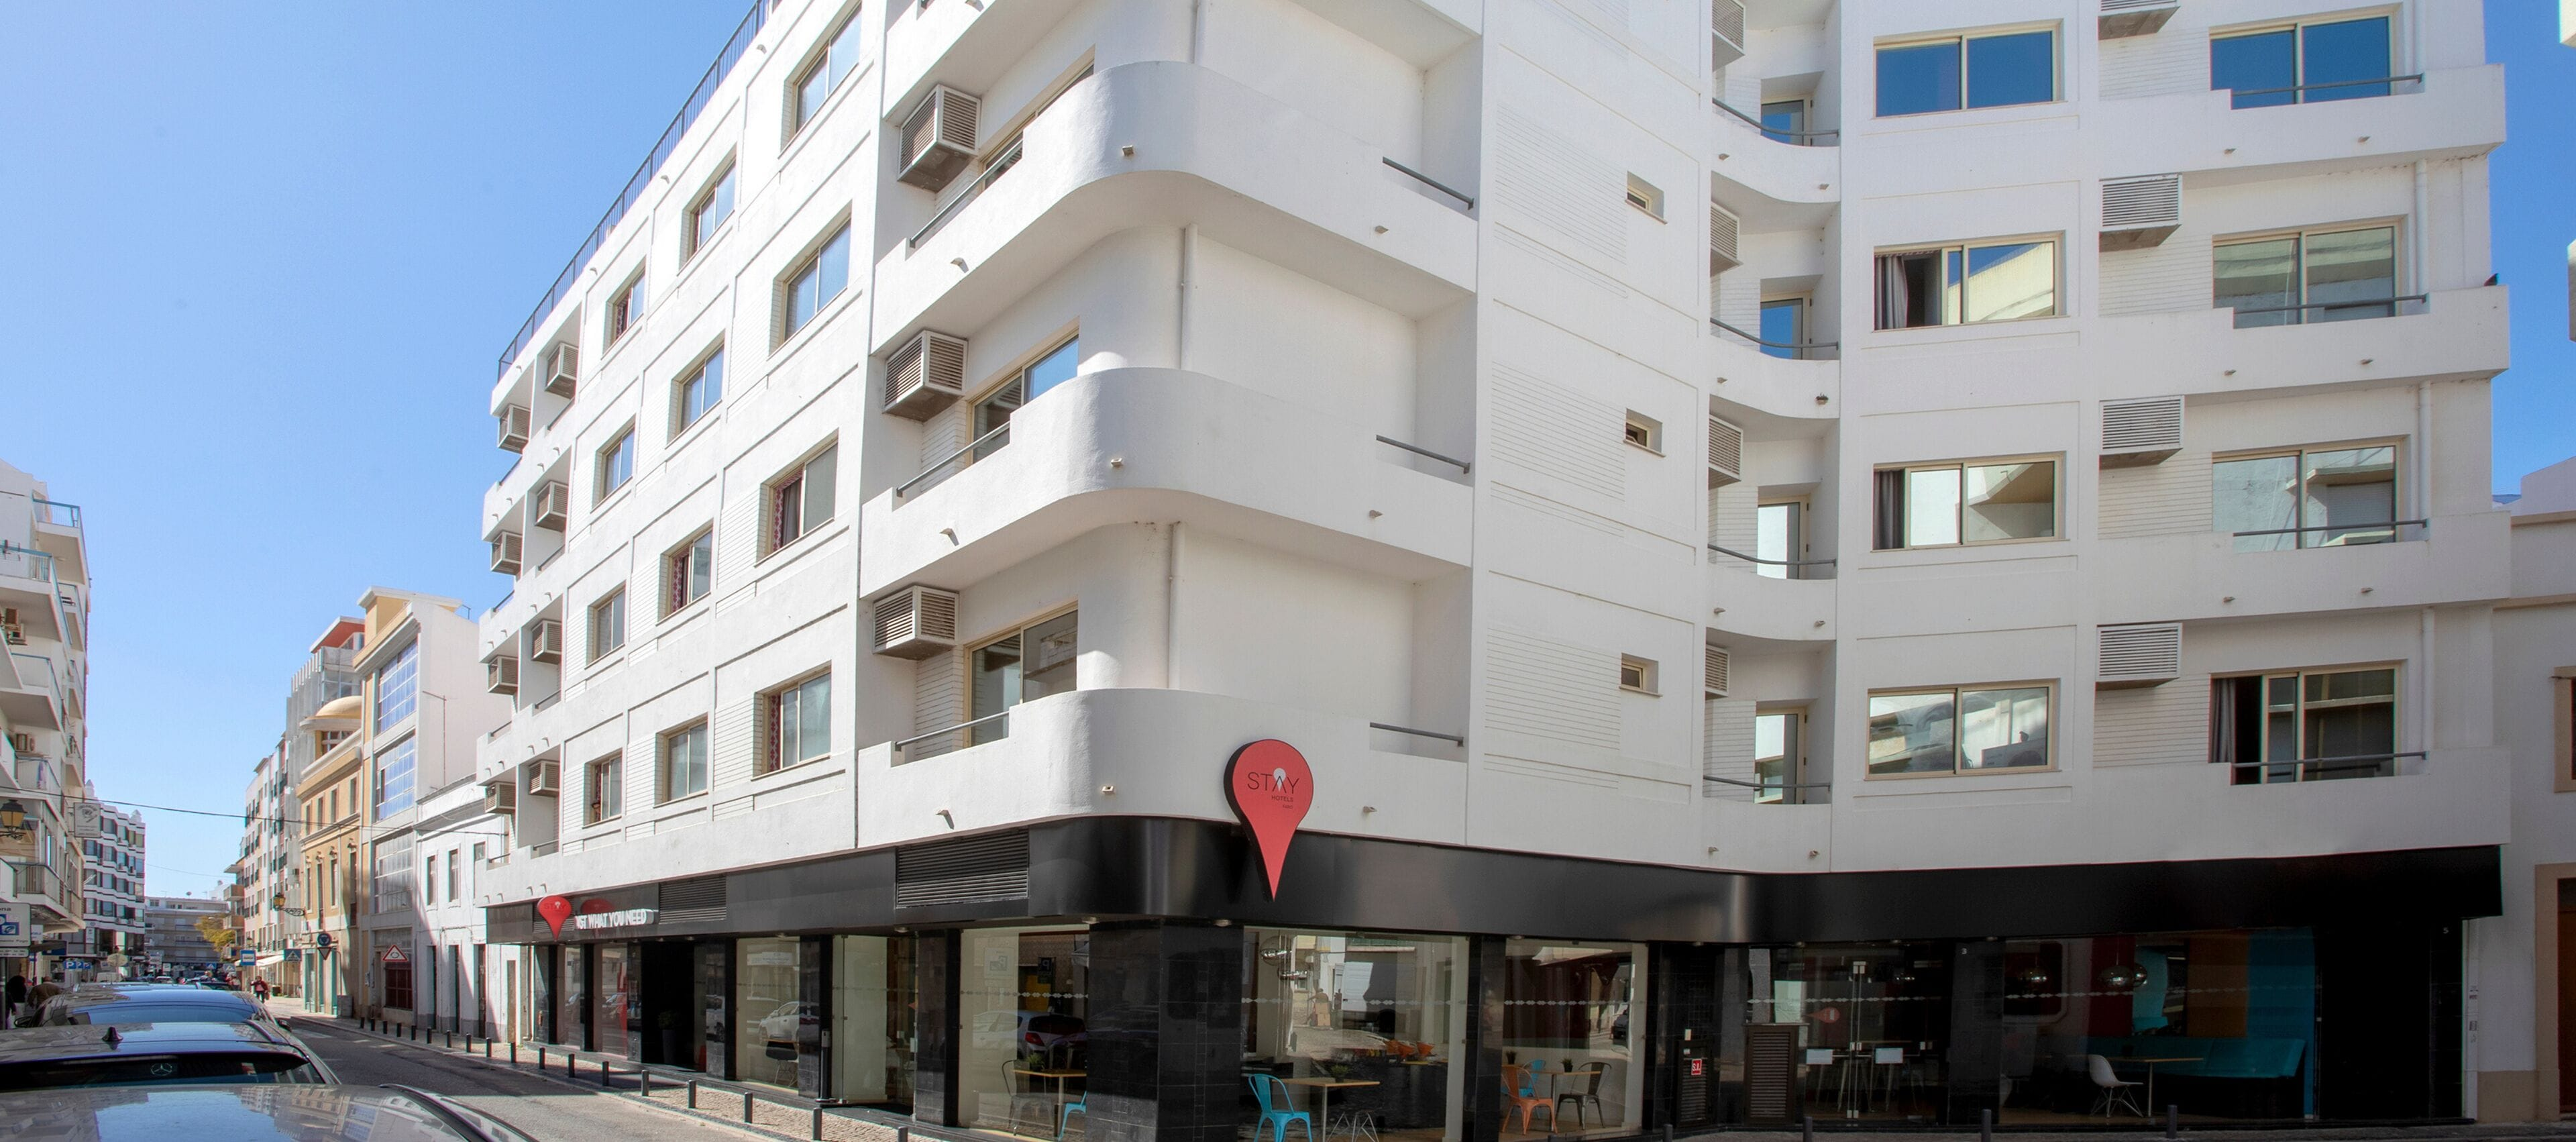 Stay Hotel Faro Centro (old Santa Maria Hotel)